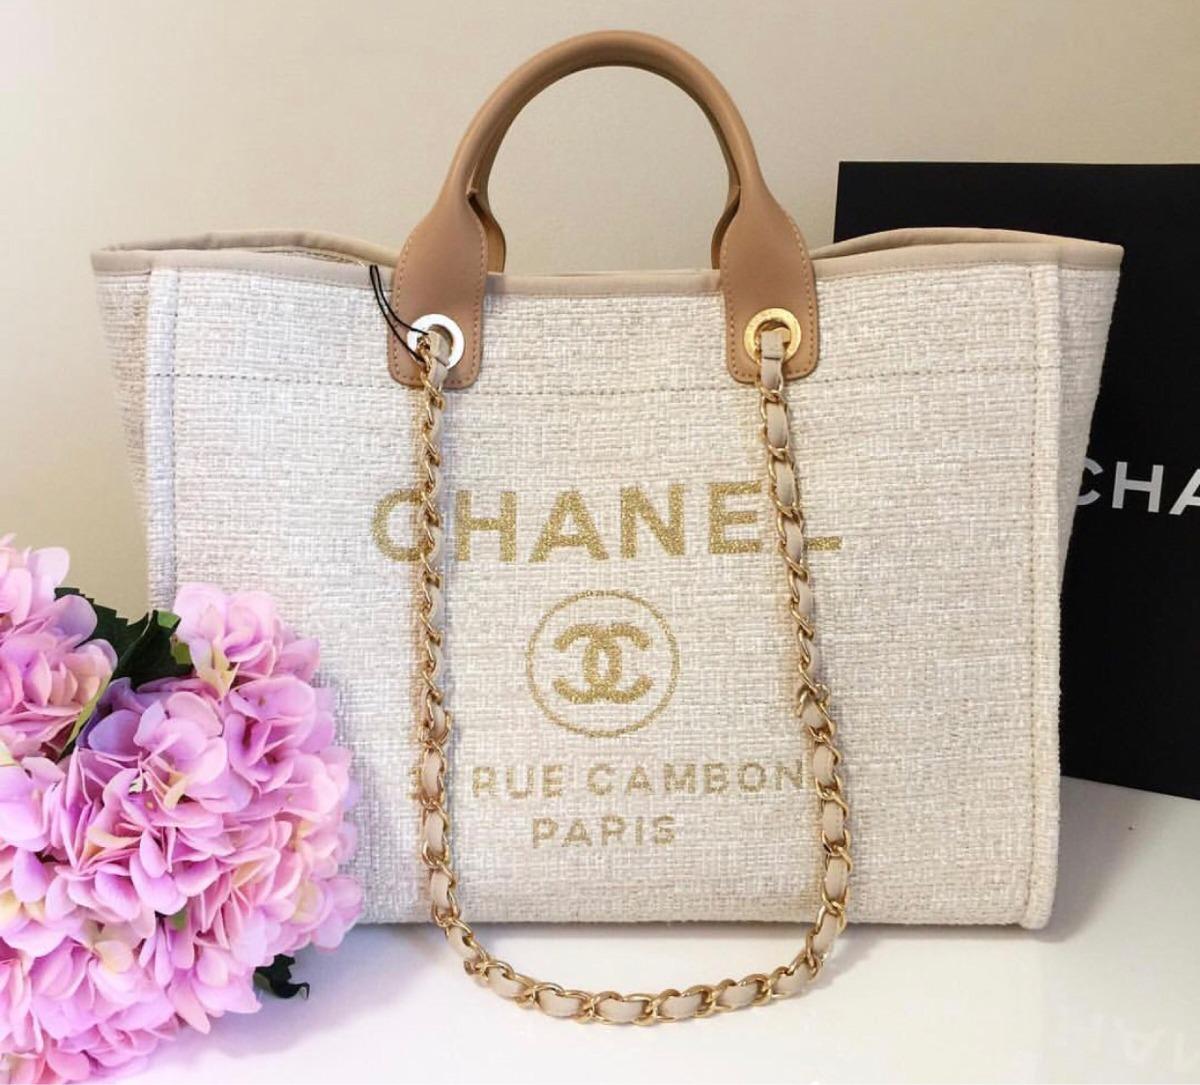 6f014f30c12177 Bolsa Chanel Deauville Cambon Cor Nova 2018 - R$ 2.999,00 em Mercado ...